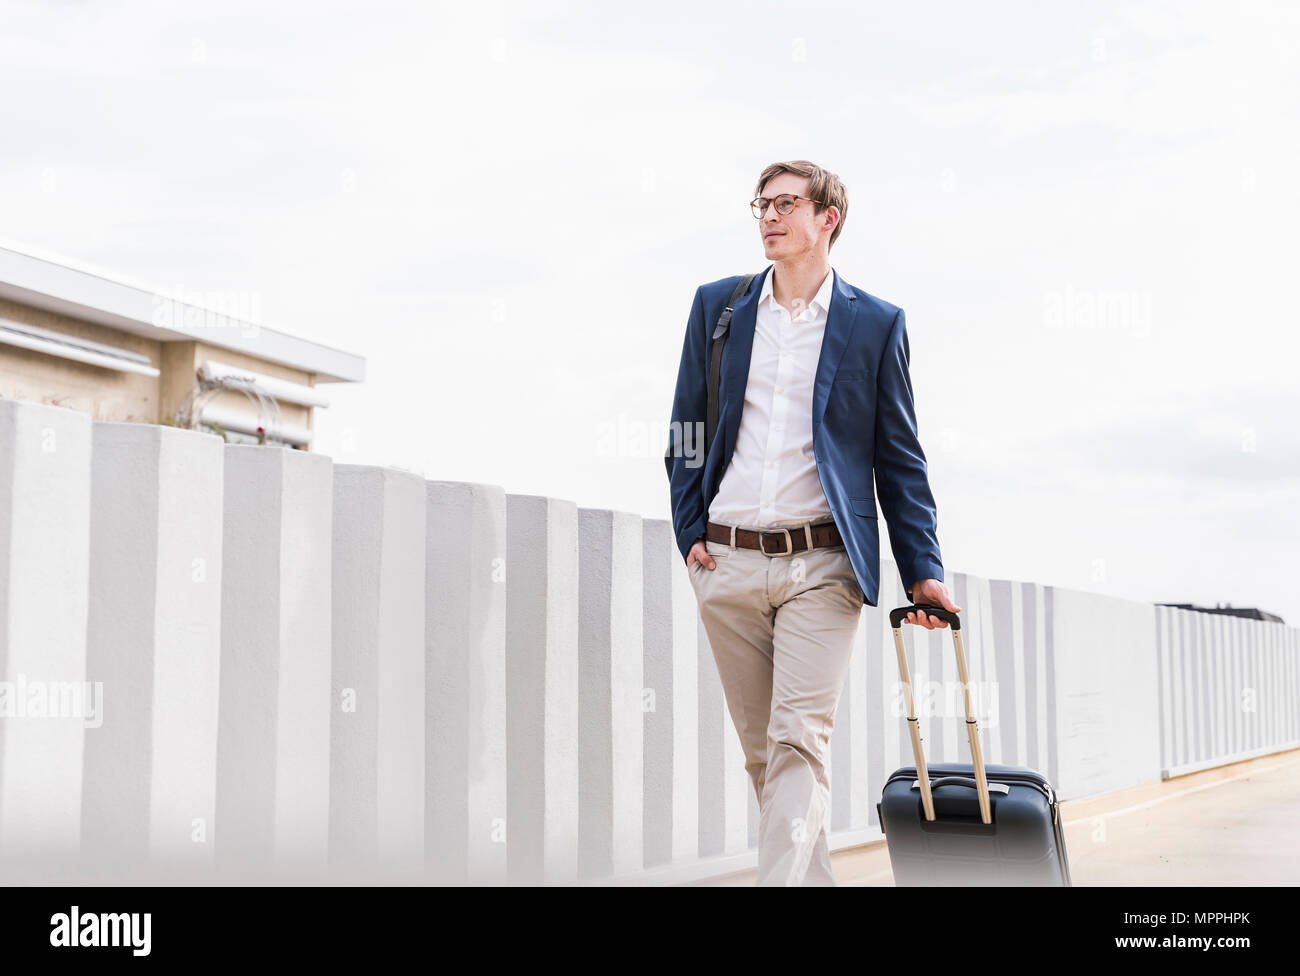 Seguros de empresario con maleta con ruedas caminando en garaje Imagen De Stock